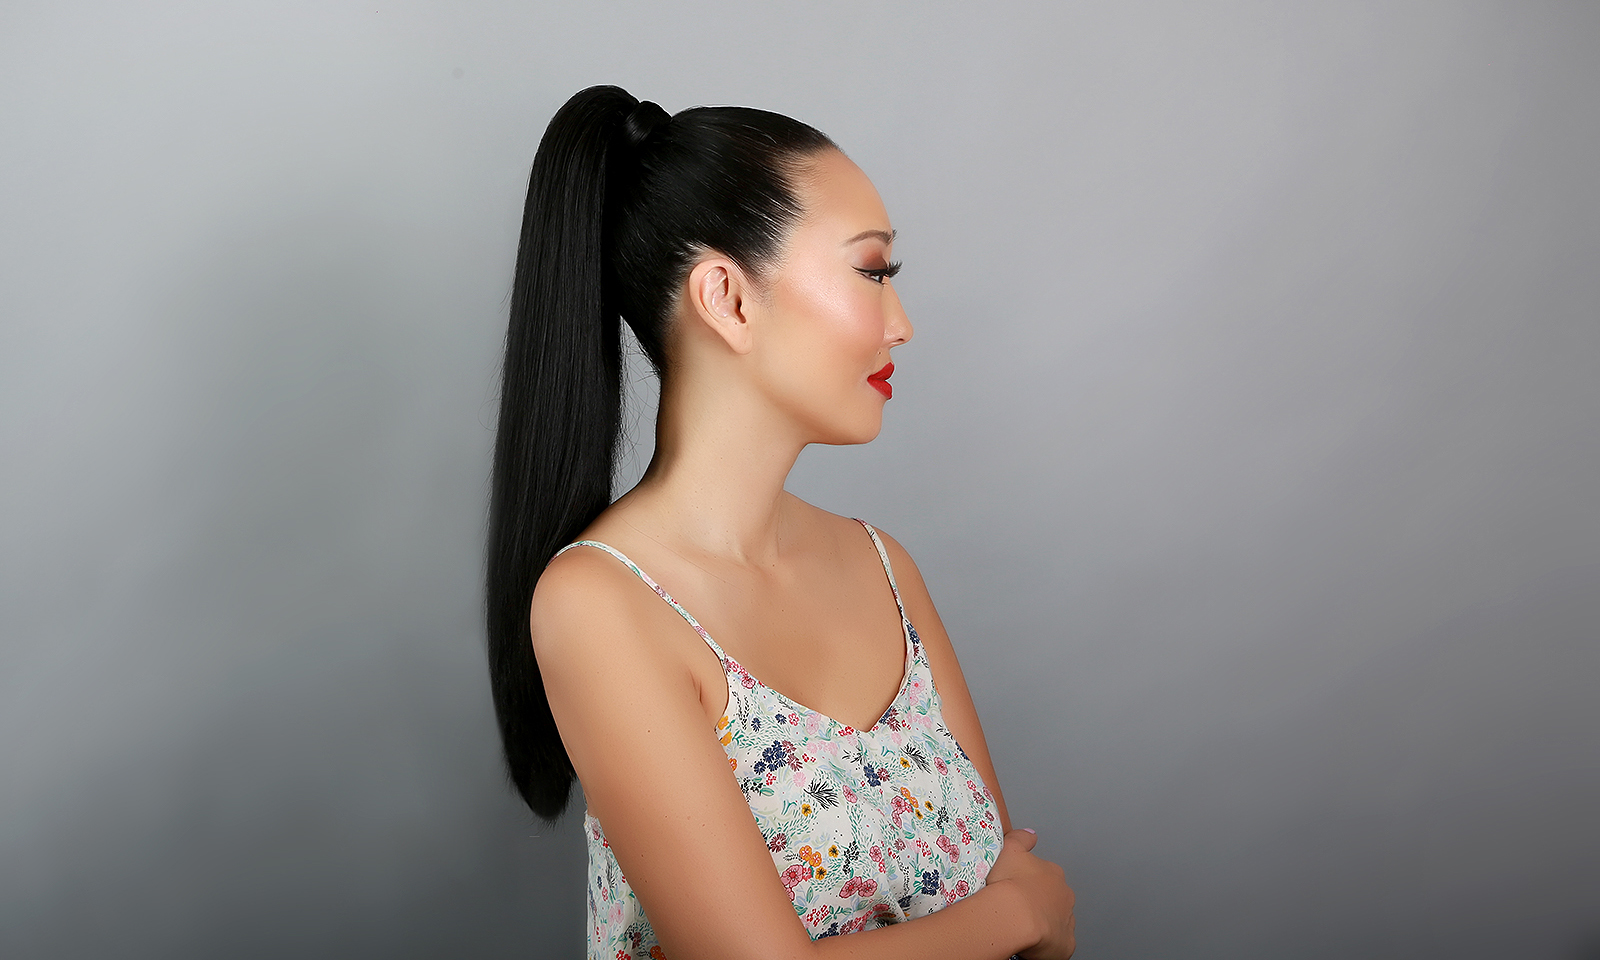 Candace-Kita-High-Ponytail-Yaniv-Katzav-VGM, Get the Khloe Kardashian-Inspired High Ponytail!